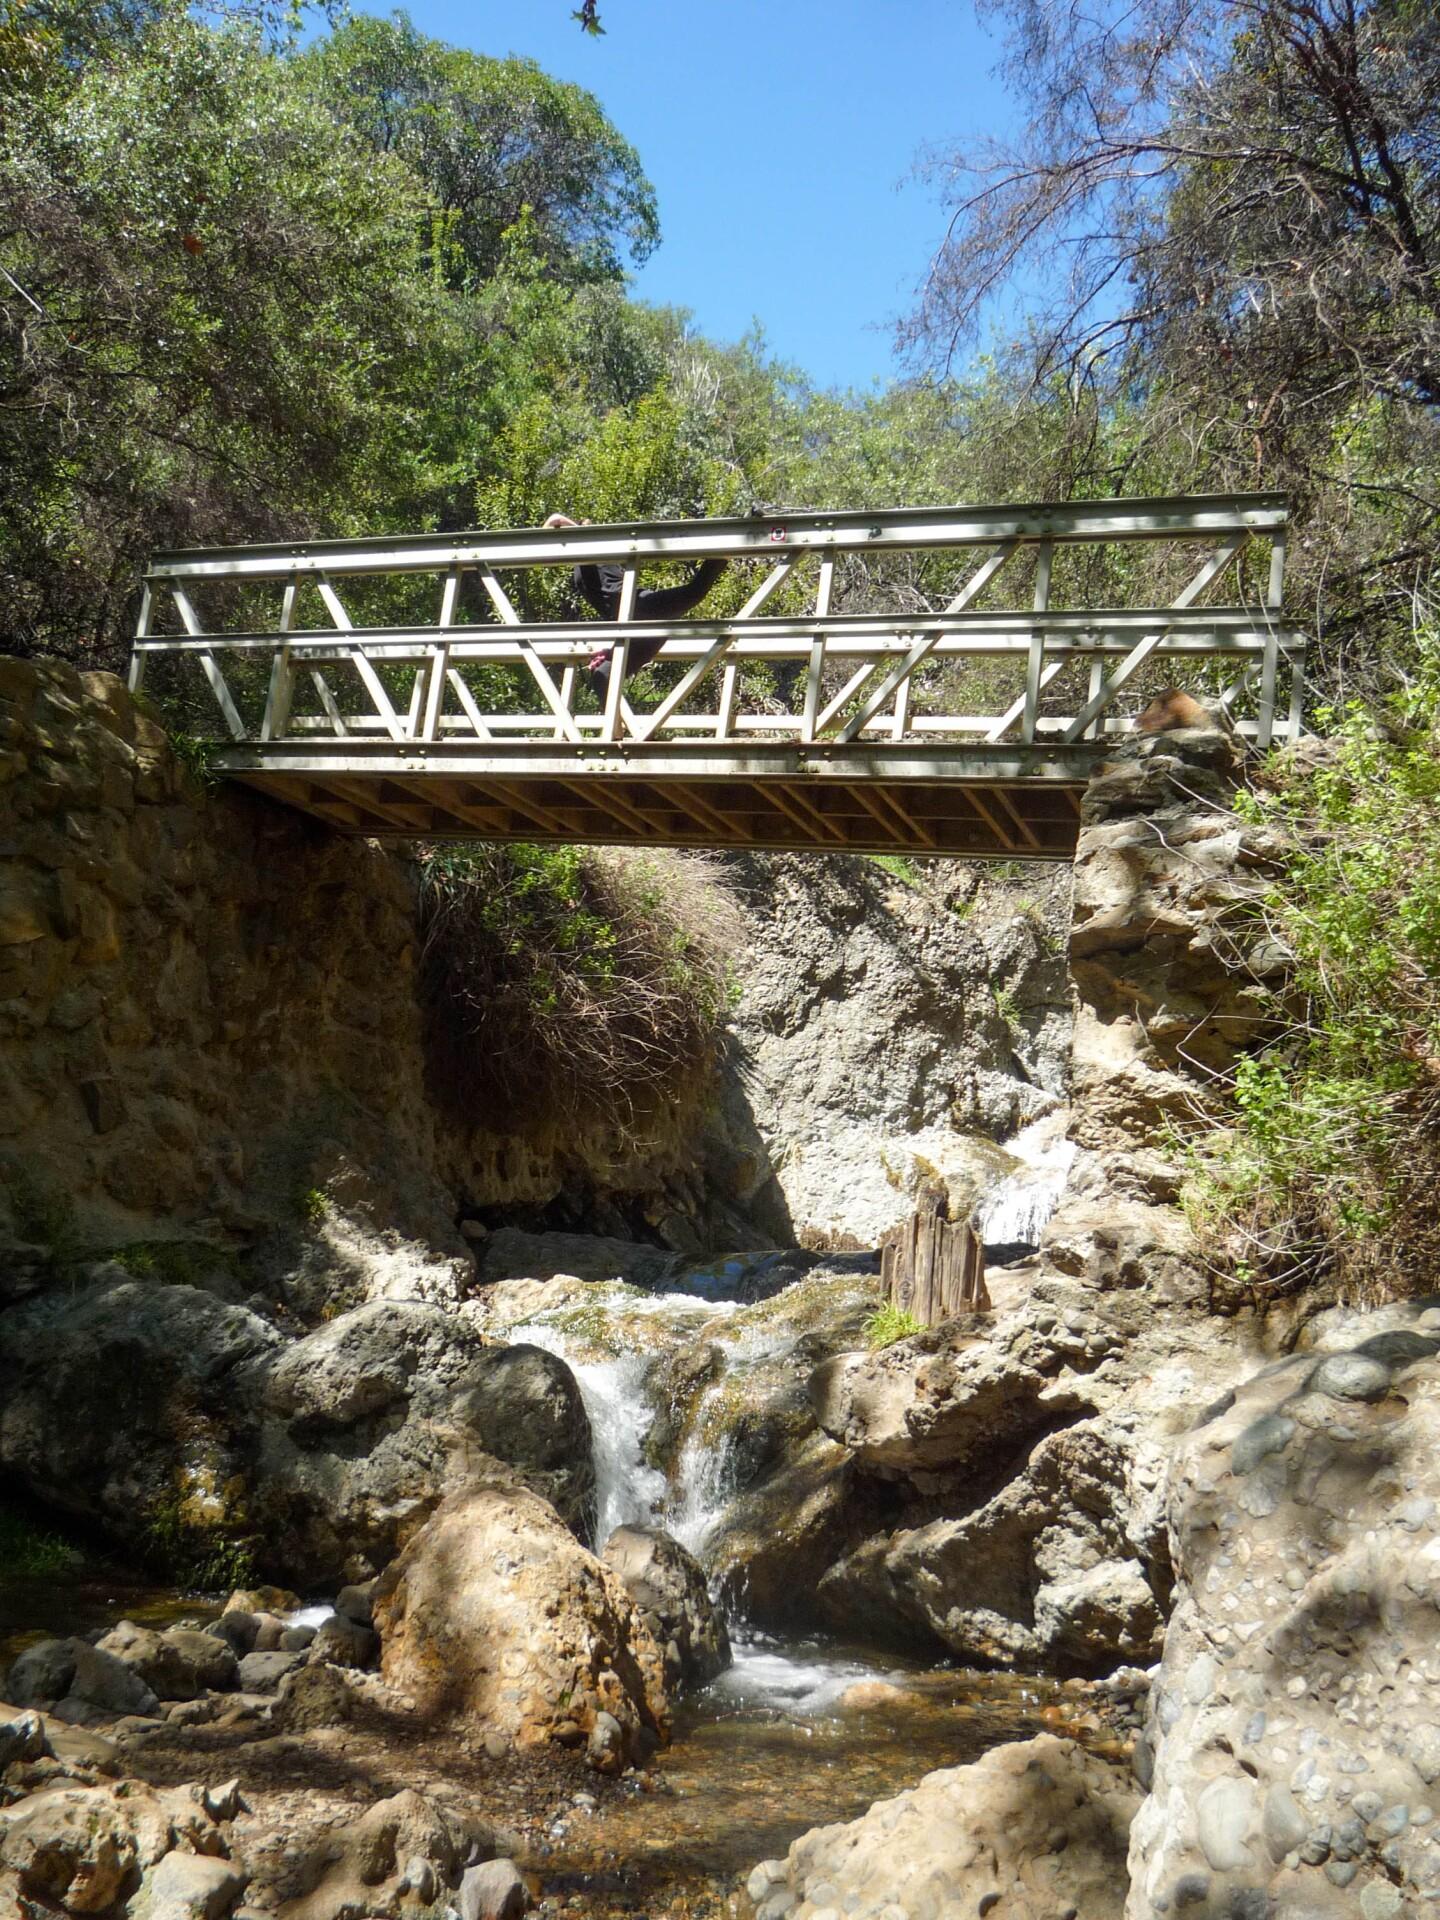 A footbridge found along the Temescal Canyon Trail in Temescal Gateway Park.